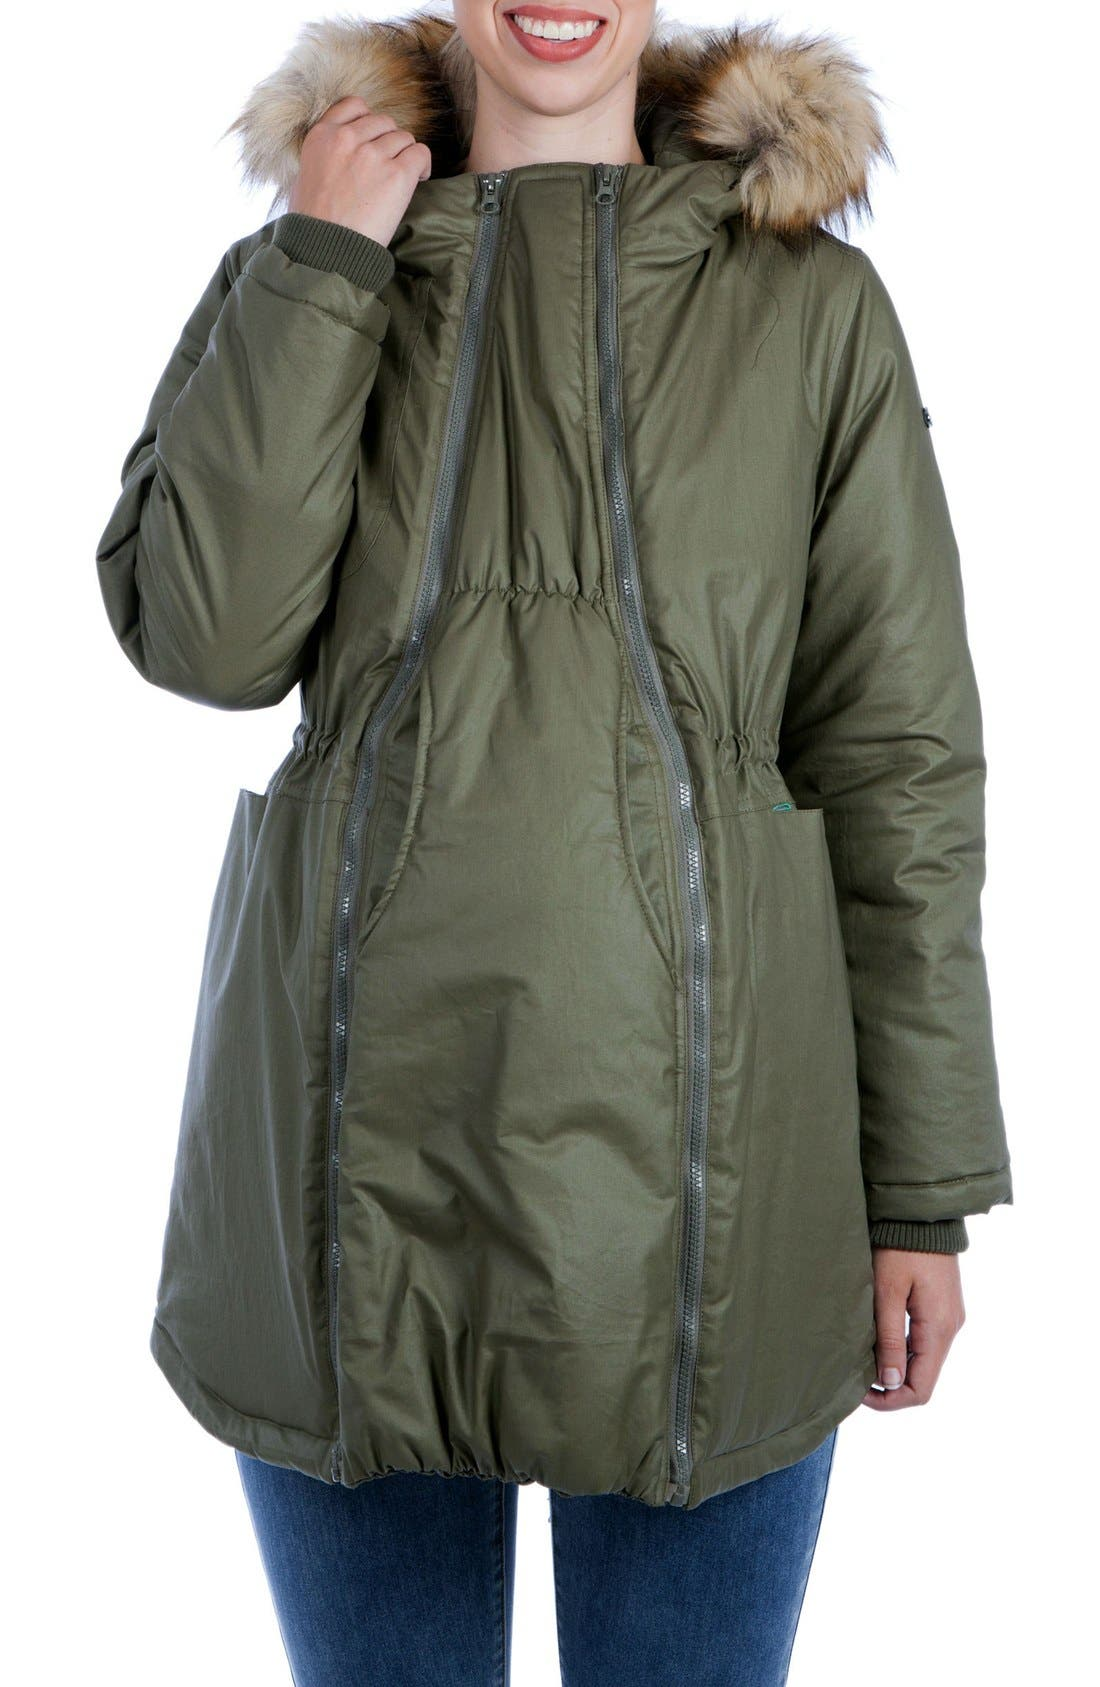 Modern Eternity Sofia Waxed Shell Maternity Jacket with Faux Fur Trim